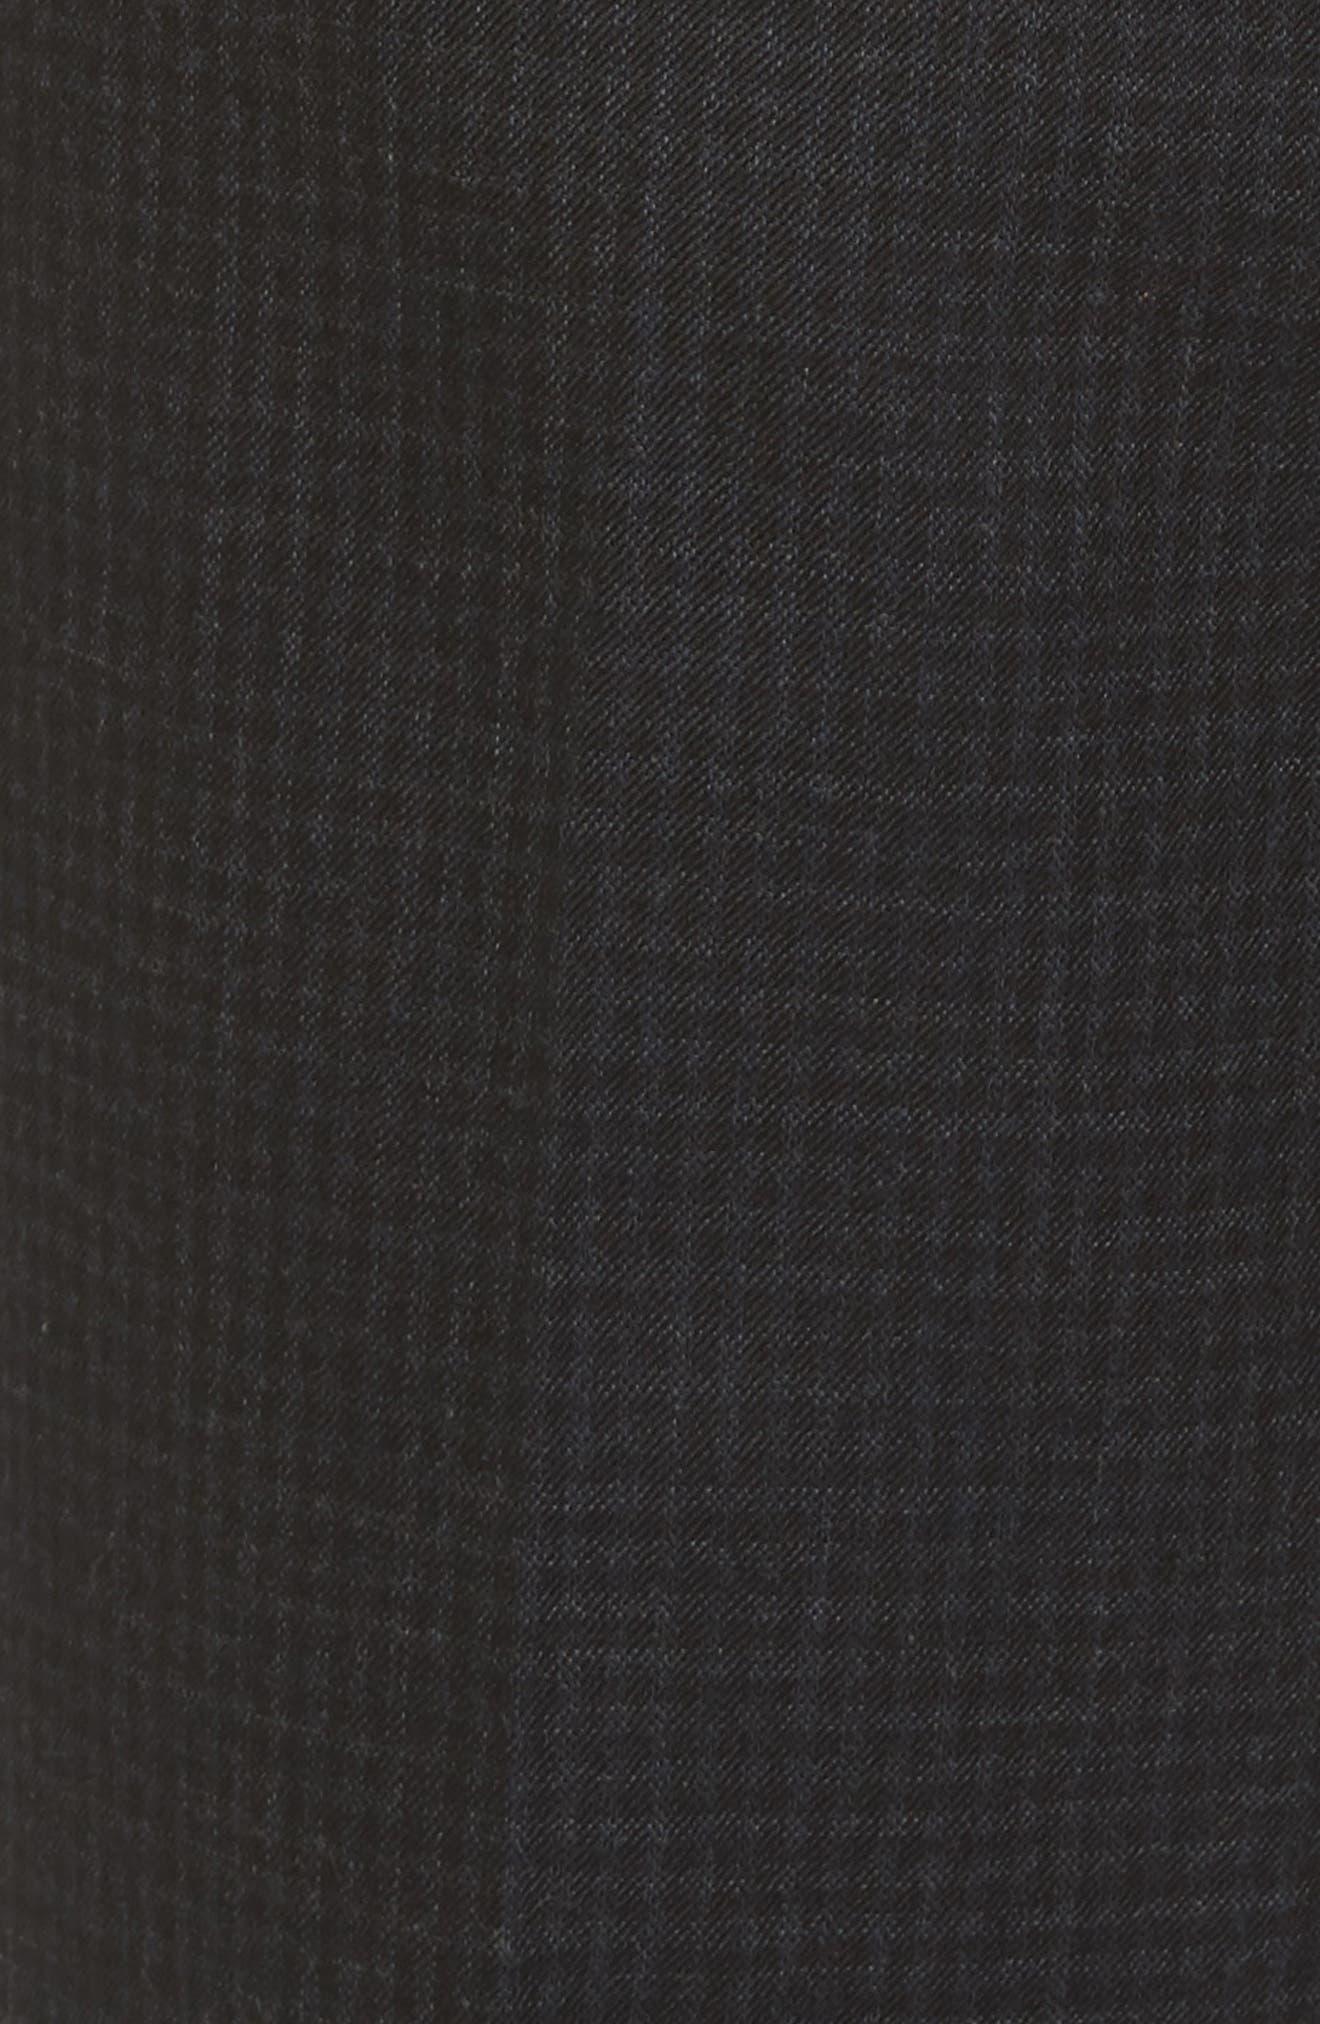 Jake Slim Fit Wool Flannel Pants,                             Alternate thumbnail 2, color,